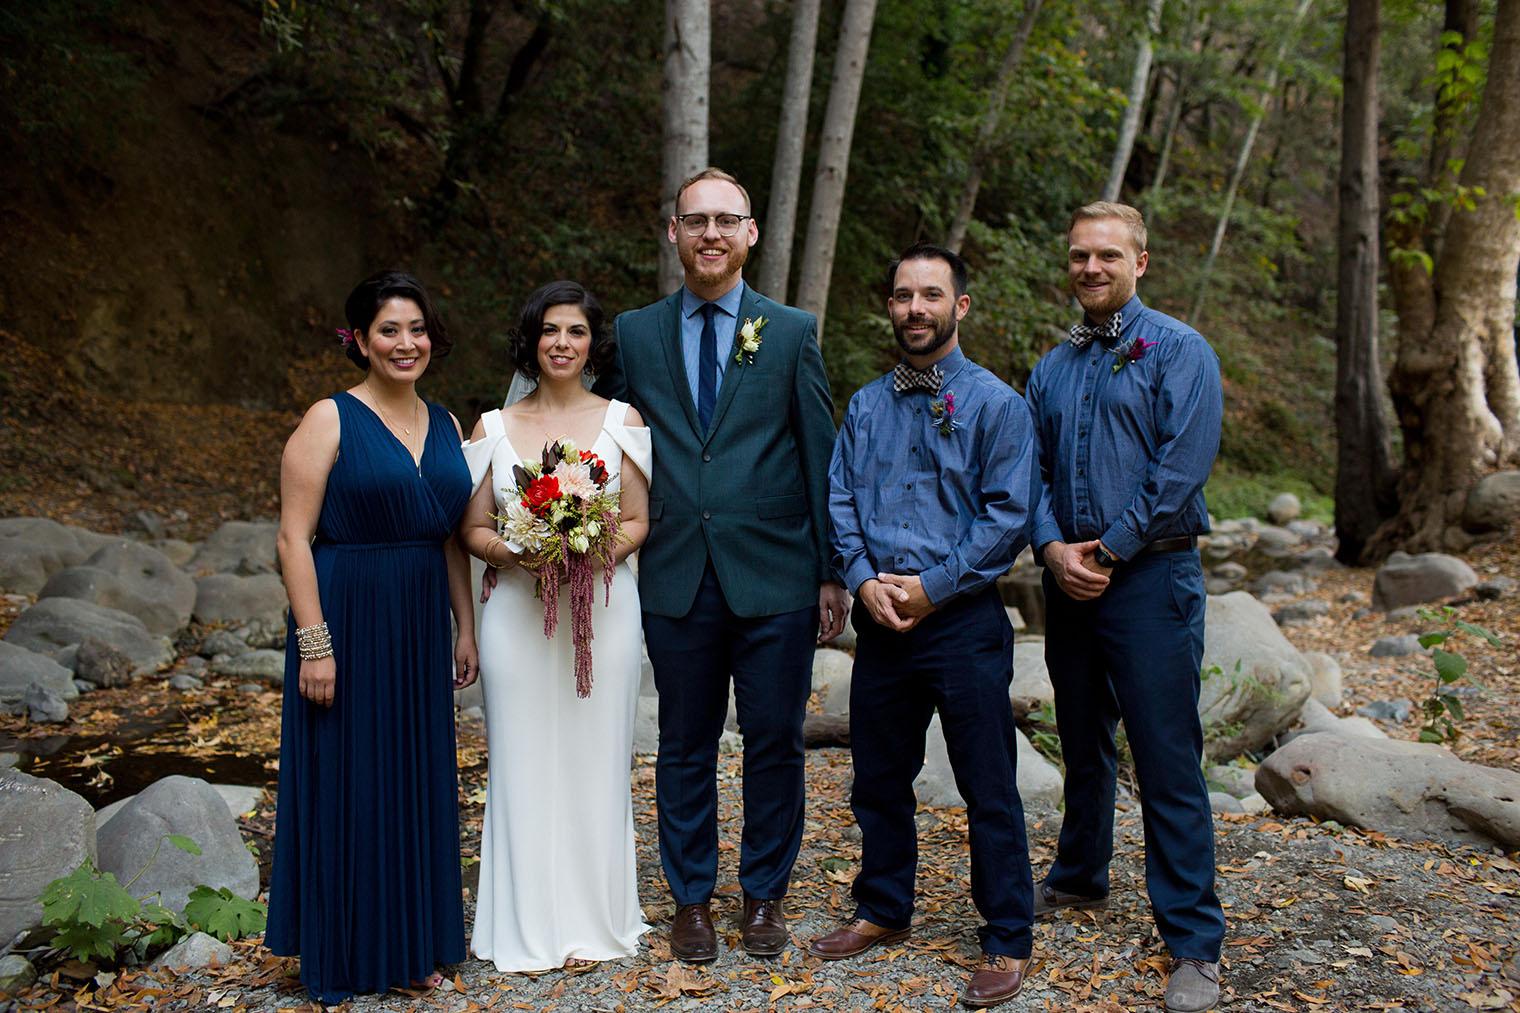 bridal party at Saratoga Springs